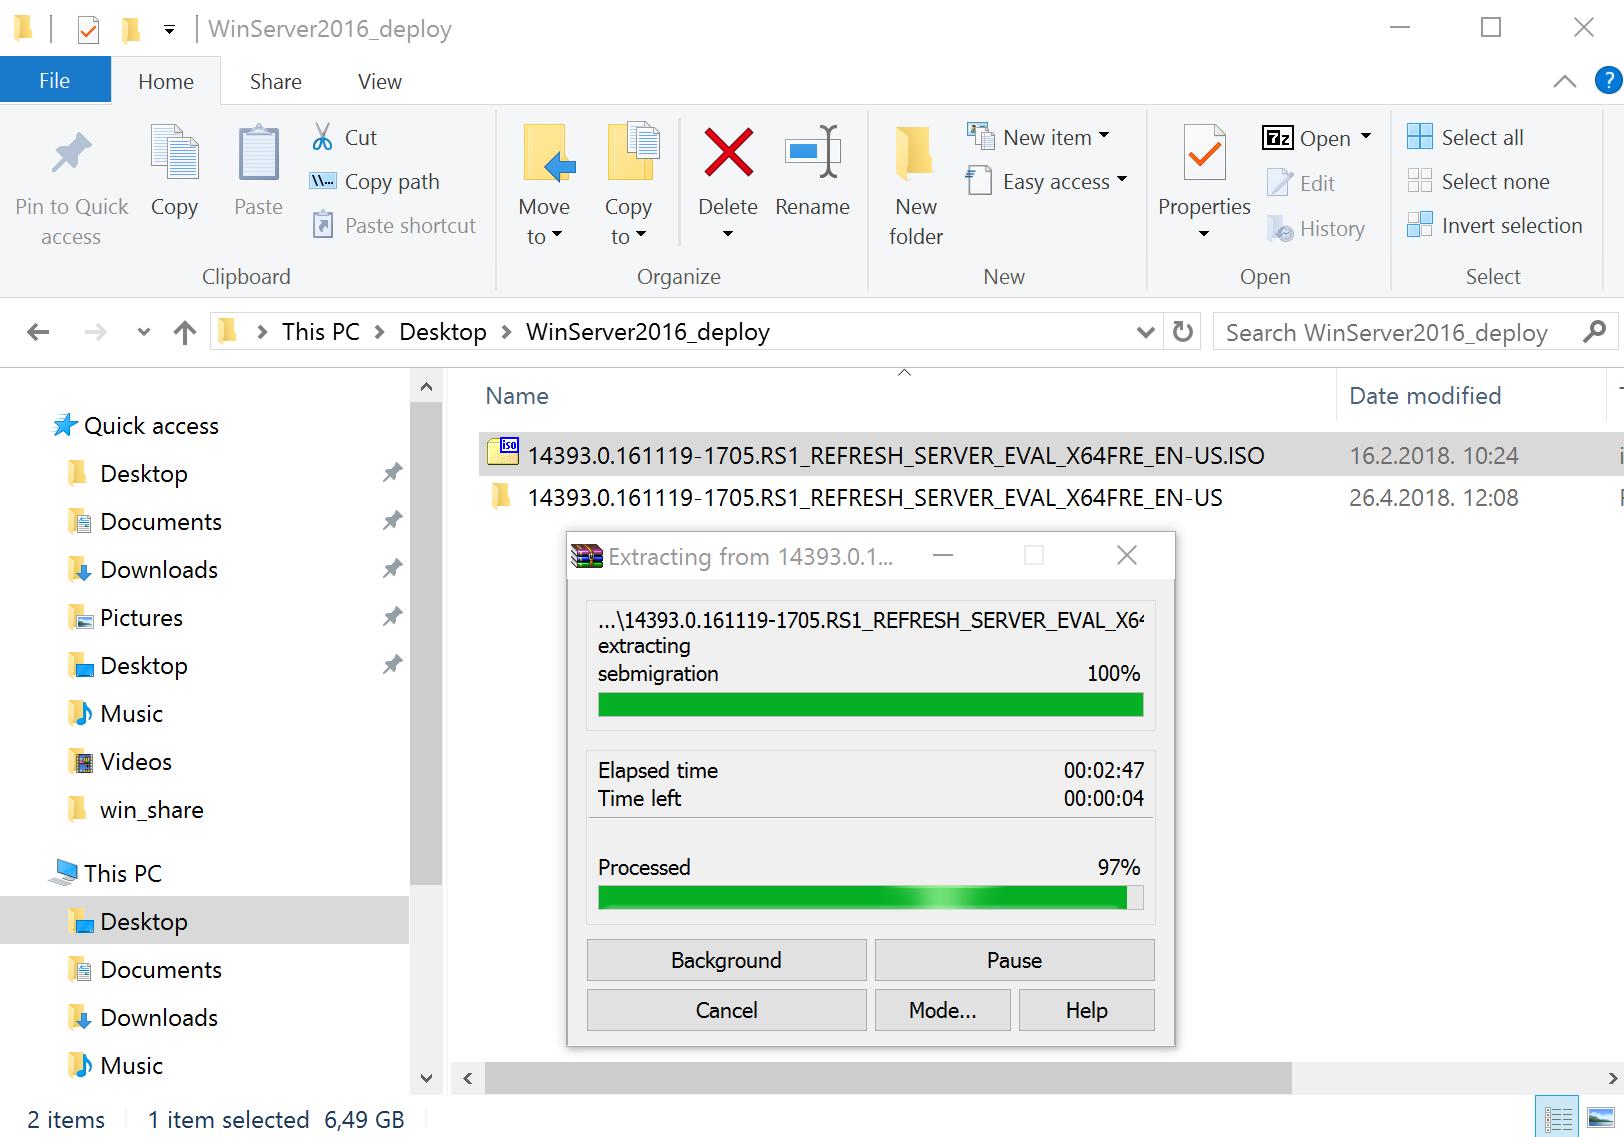 Windows Installation | ciscoucs github io